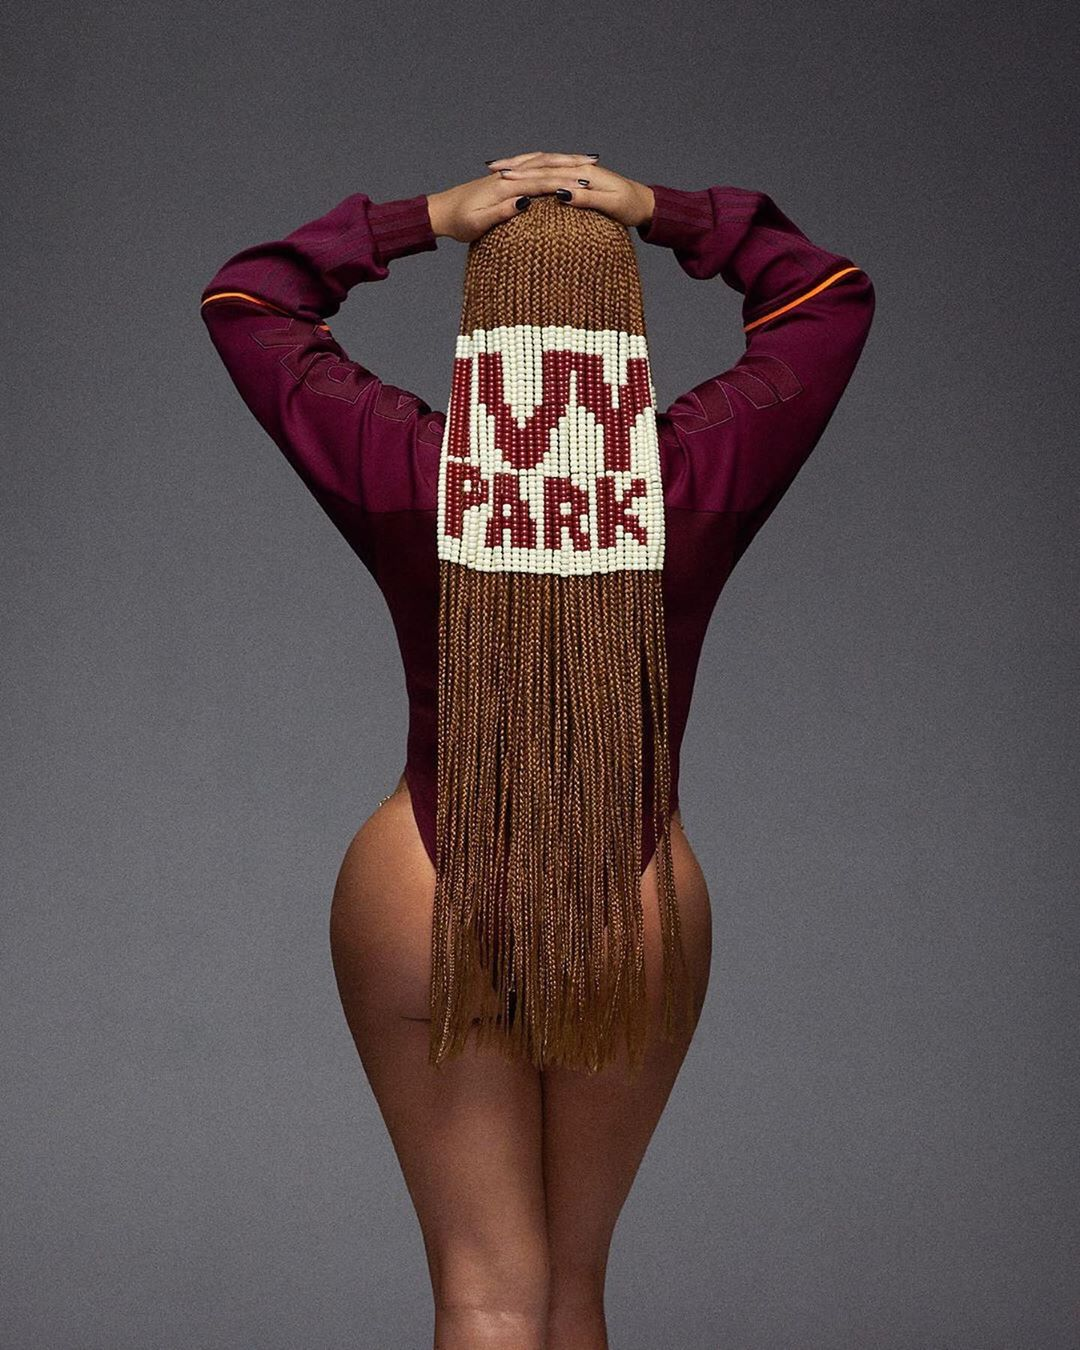 Ivy Park x Adidas - Neomag.